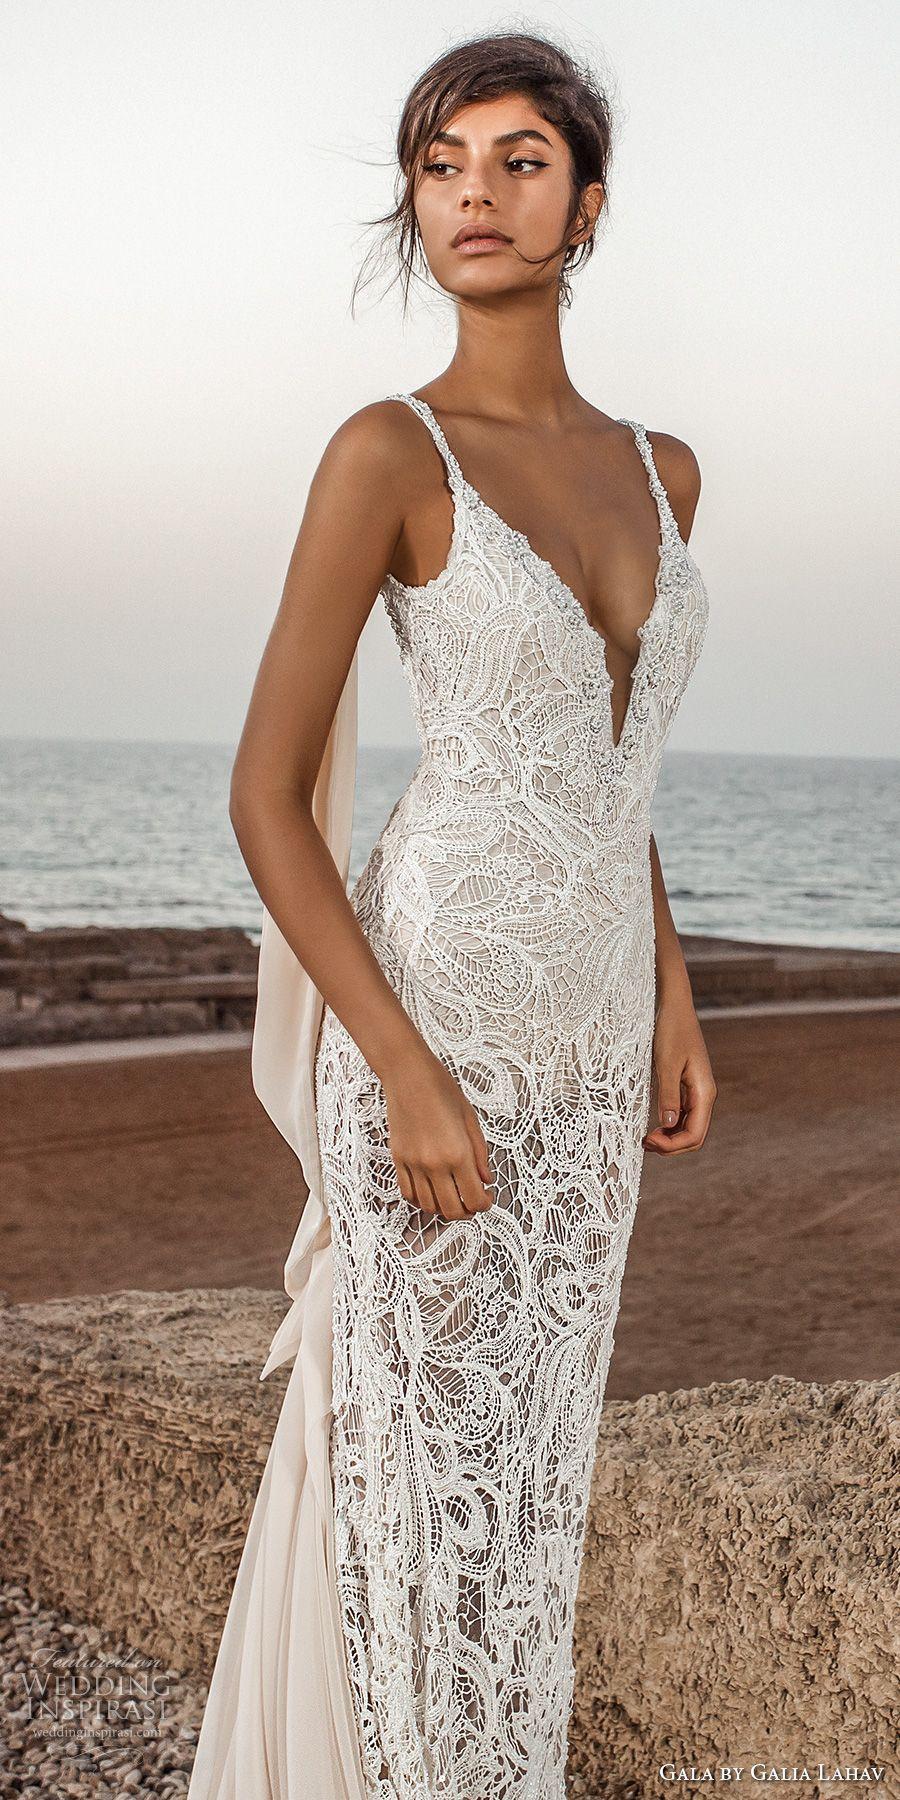 Gala by galia lahav wedding dresses u bridal collection no iii